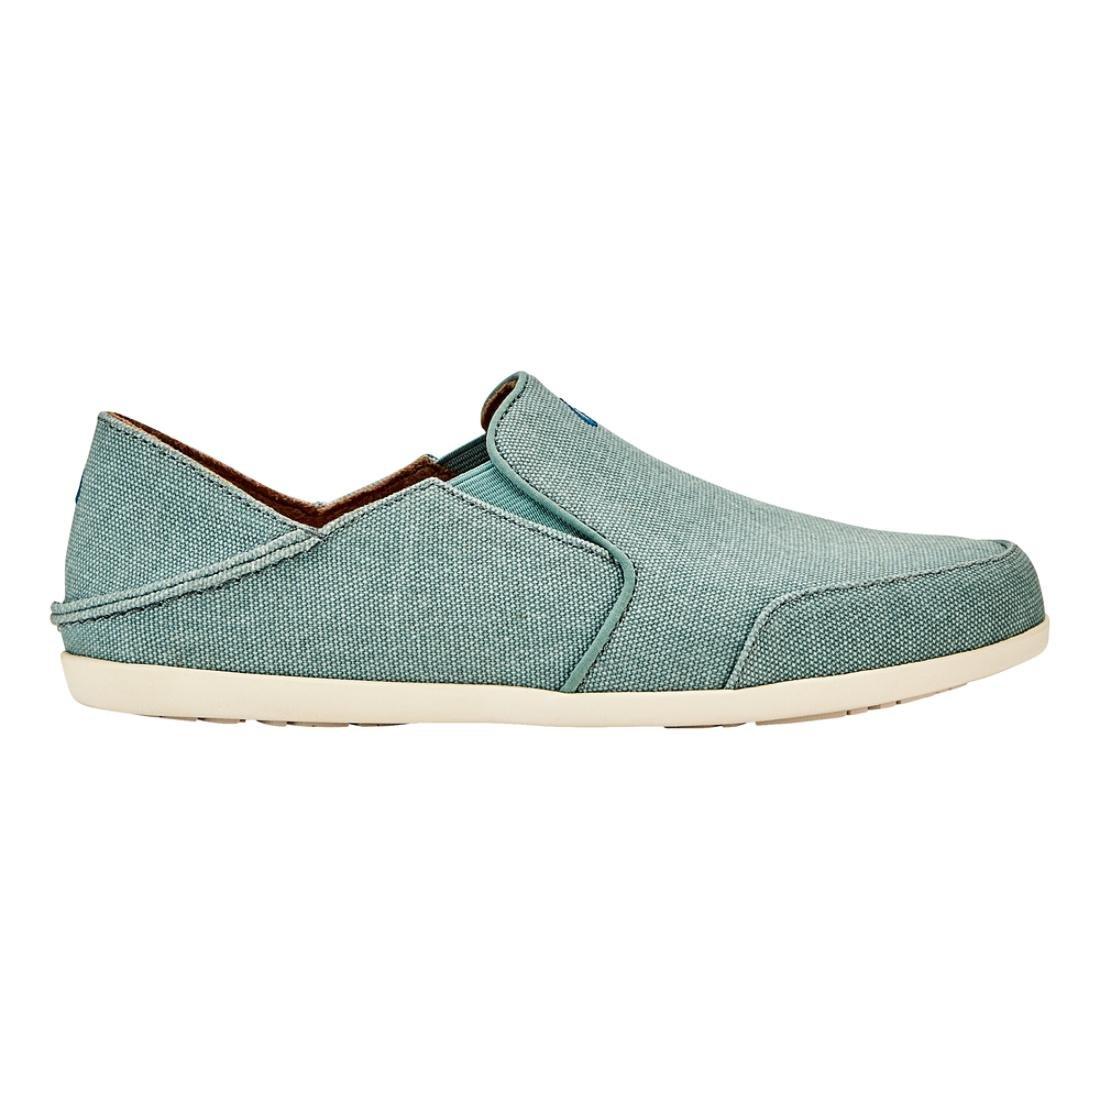 OLUKAI Waialua Canvas Shoes - Women's B079458W9R 11 B(M) US|Mineral Blue